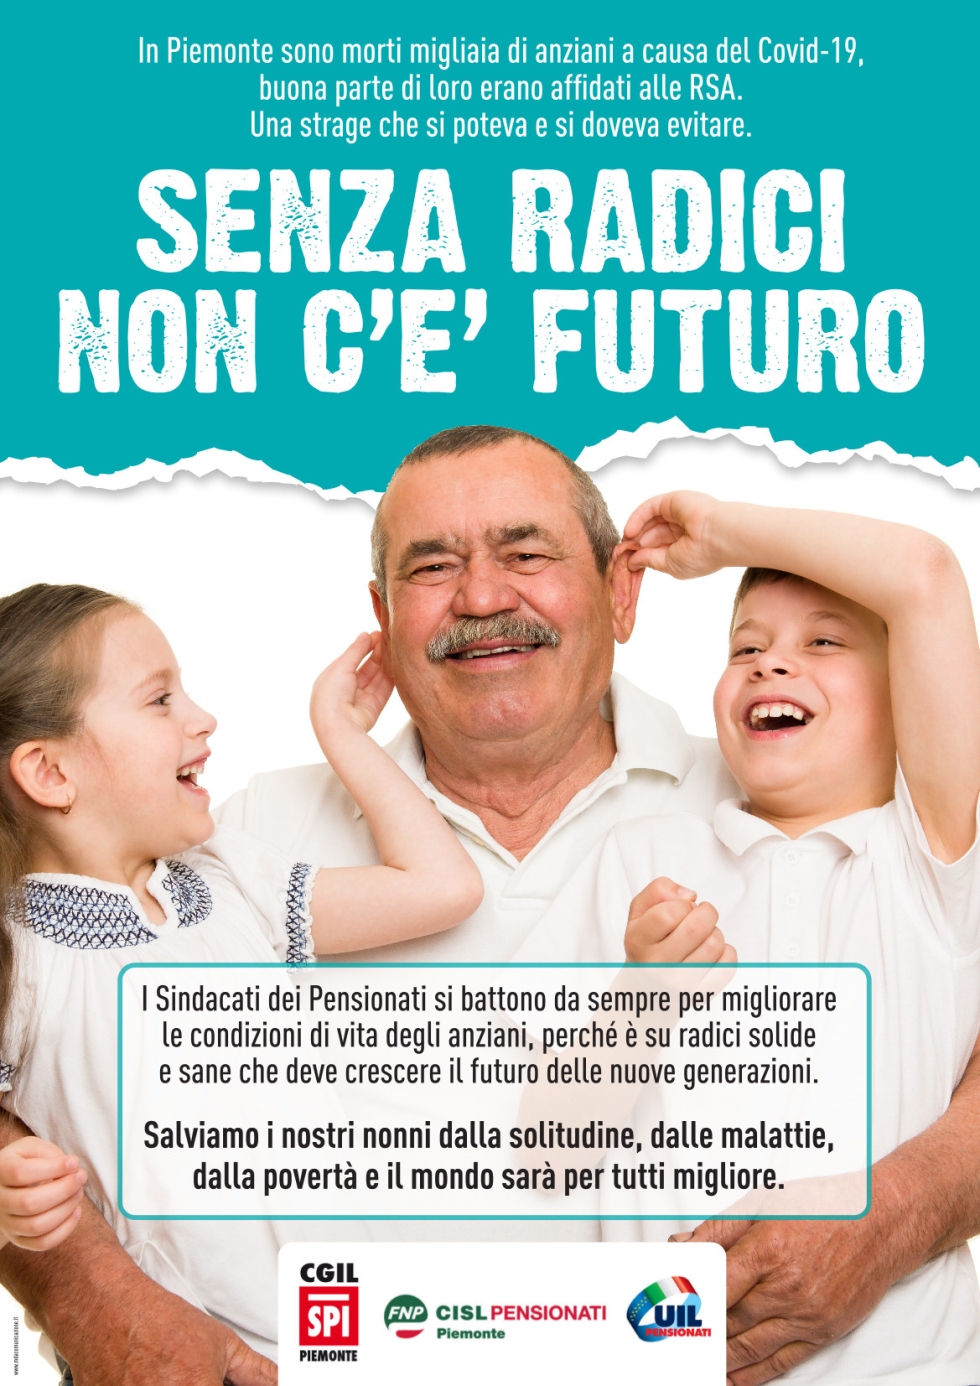 "Fnp-Spi-Uilp Piemonte: ""Senza radici non c'è futuro"""